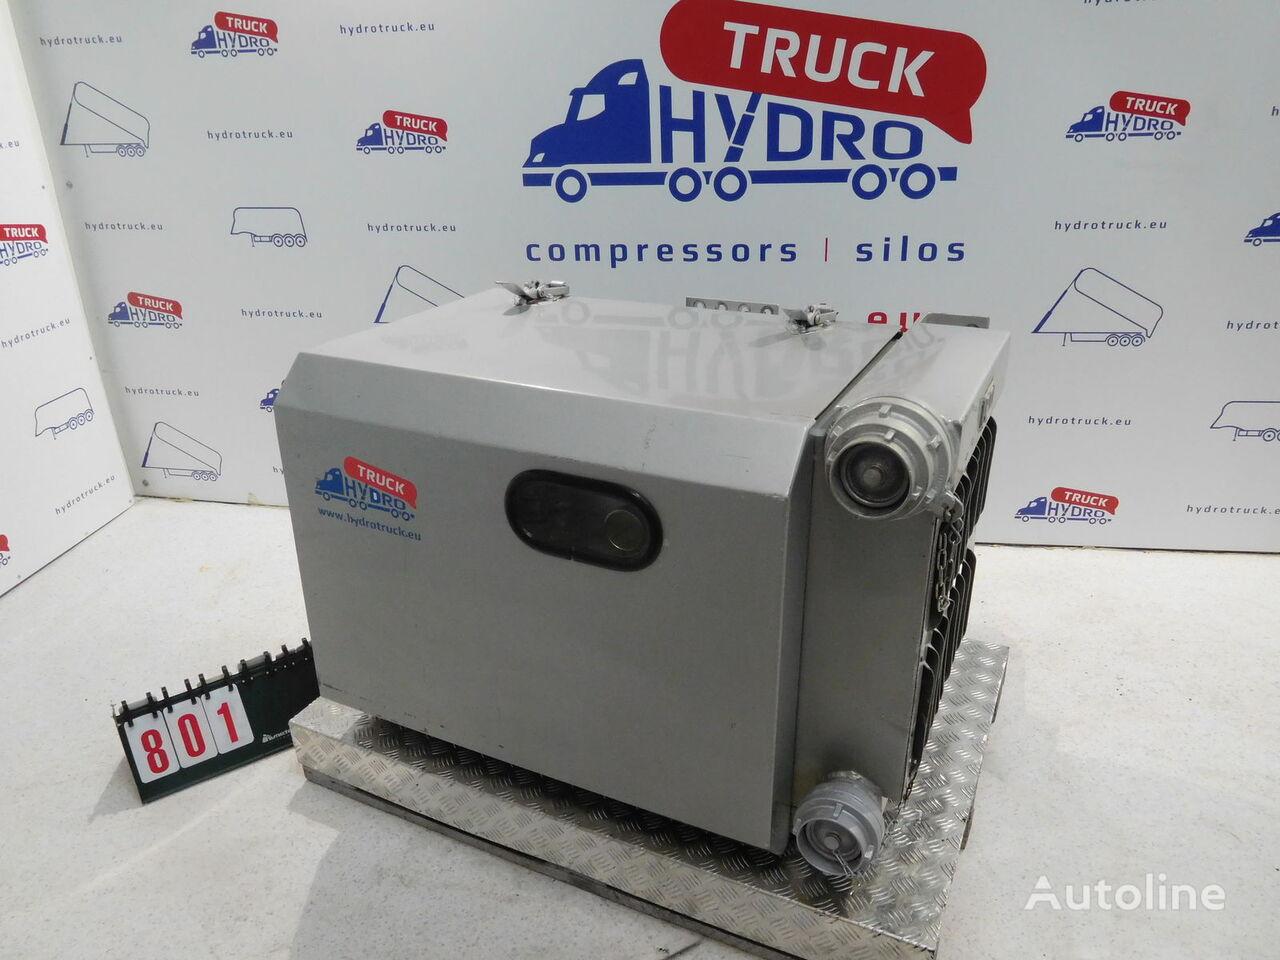 TYPHON 2C MOUVEX BLACKMER W ZABUDOWIE RTI pneumatic compressor for tank semi-trailer